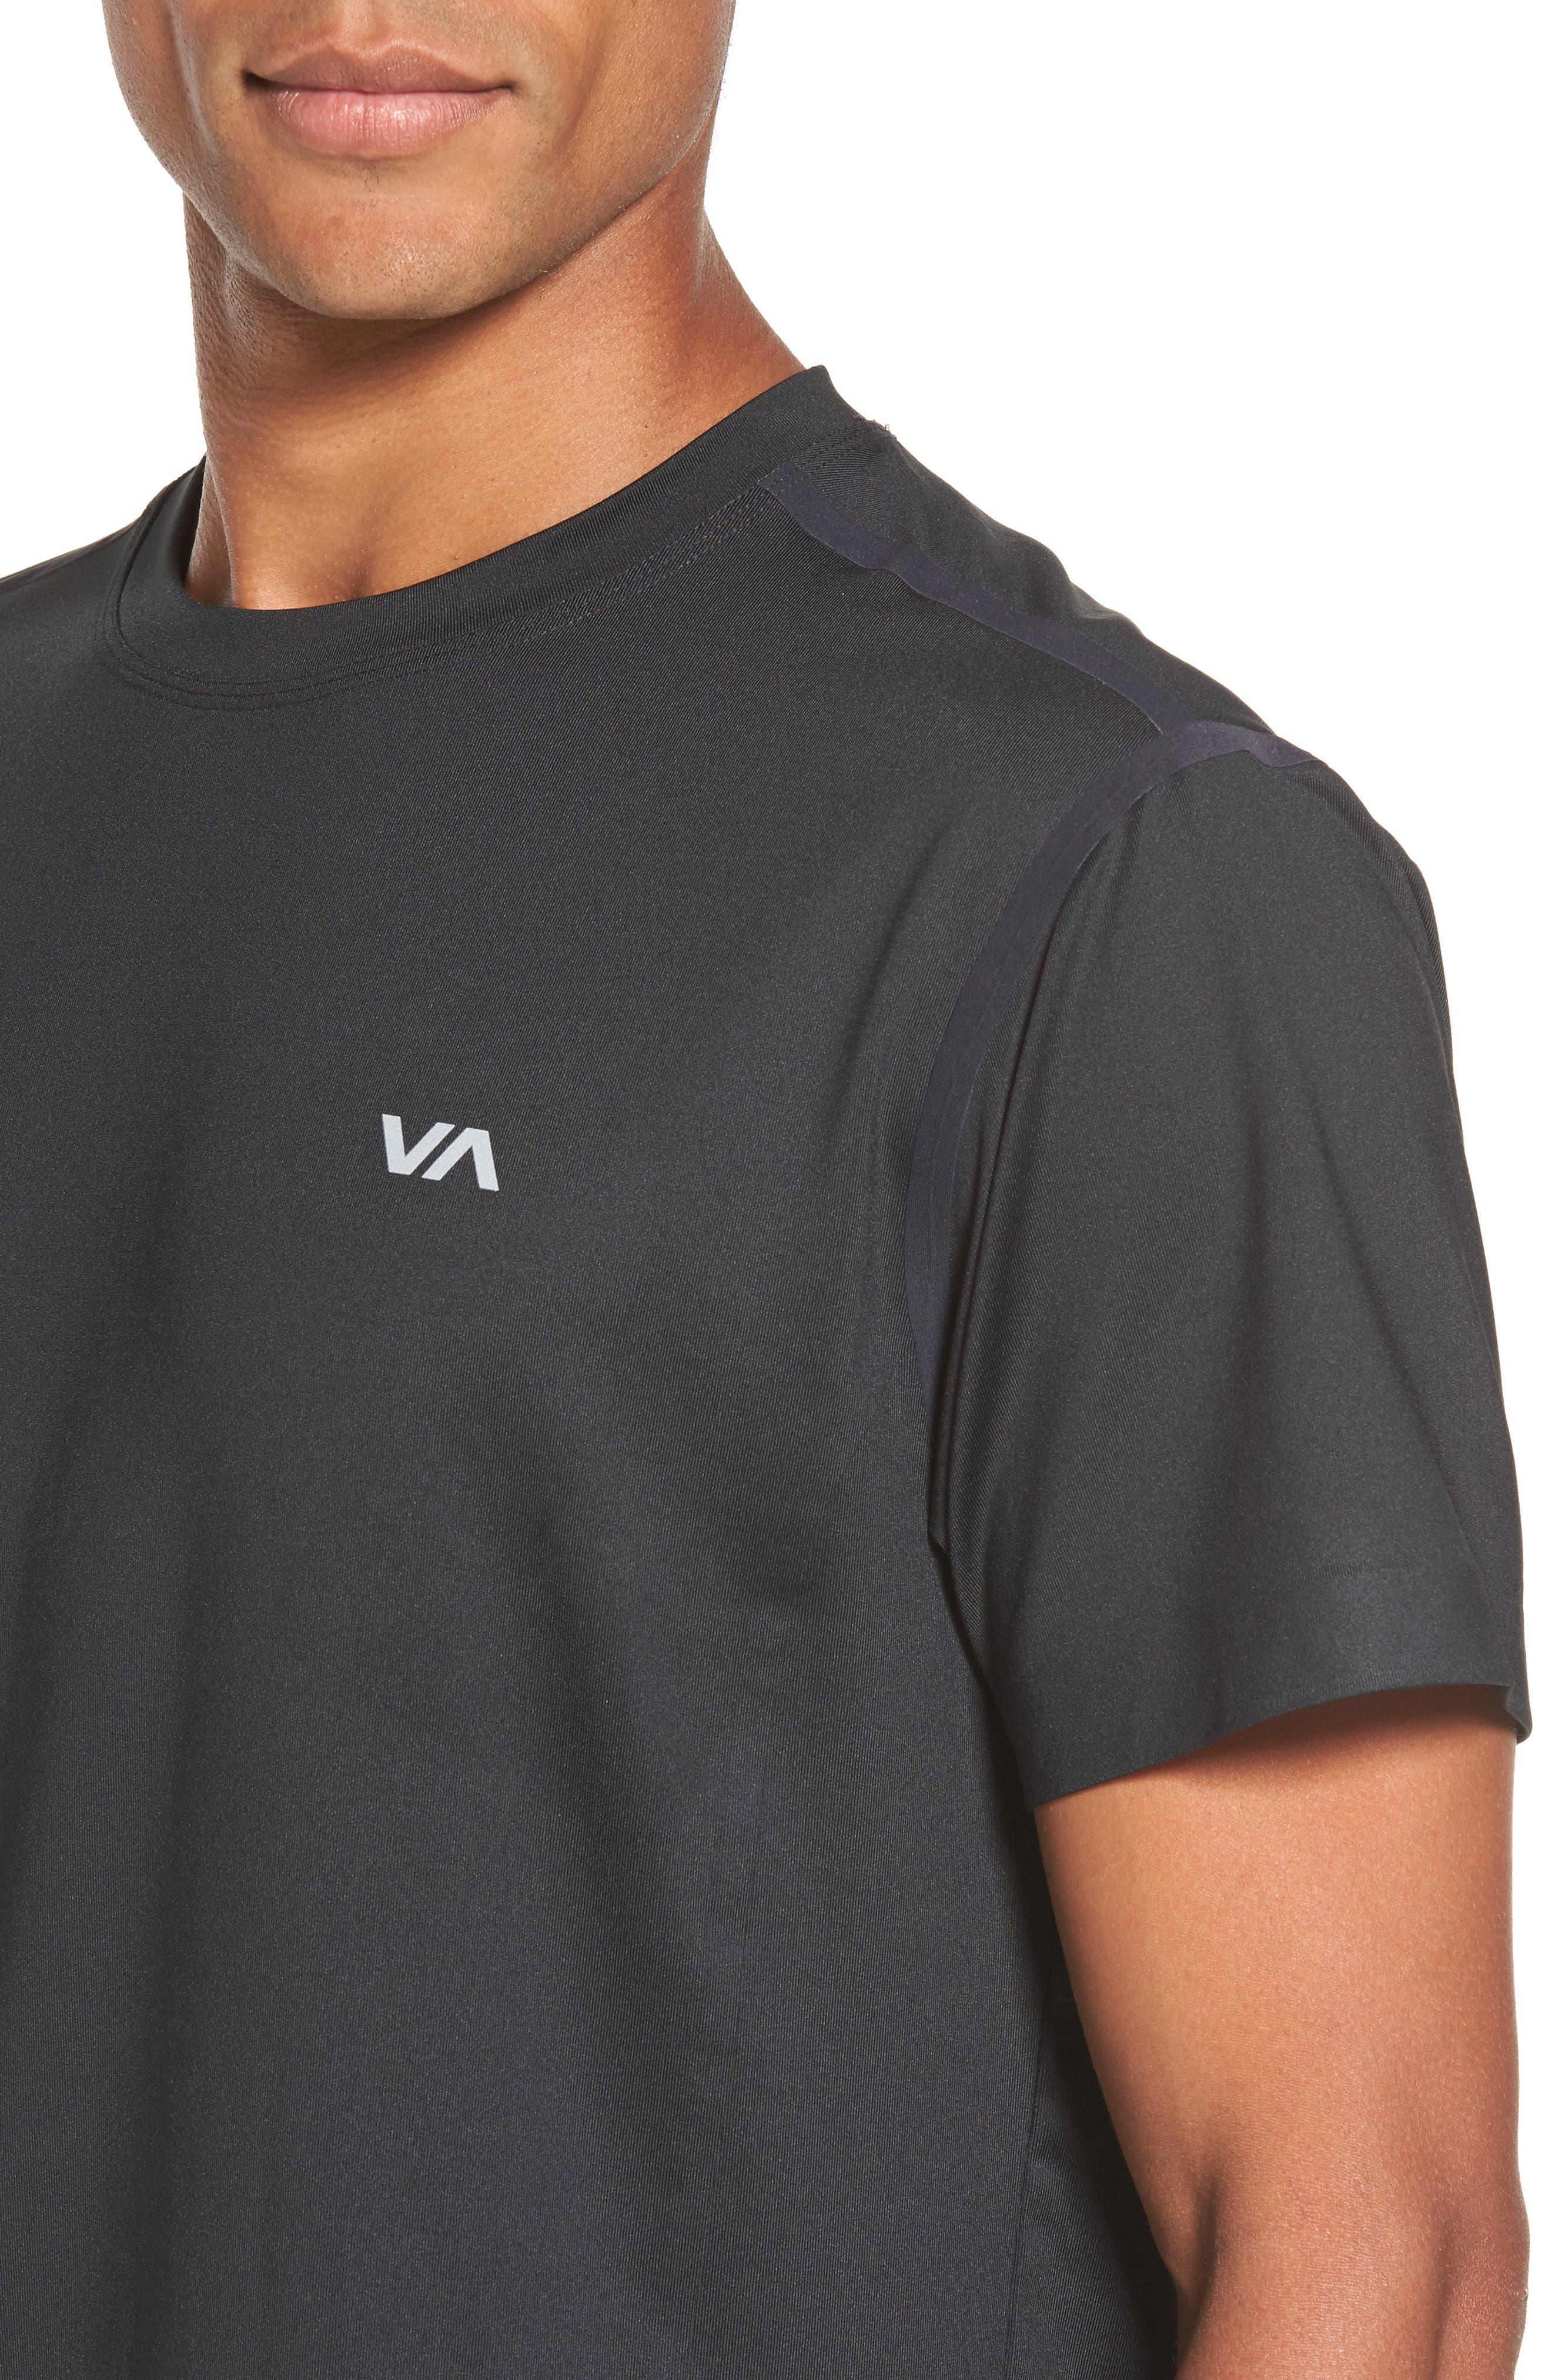 VA Compression T-Shirt,                             Alternate thumbnail 4, color,                             001